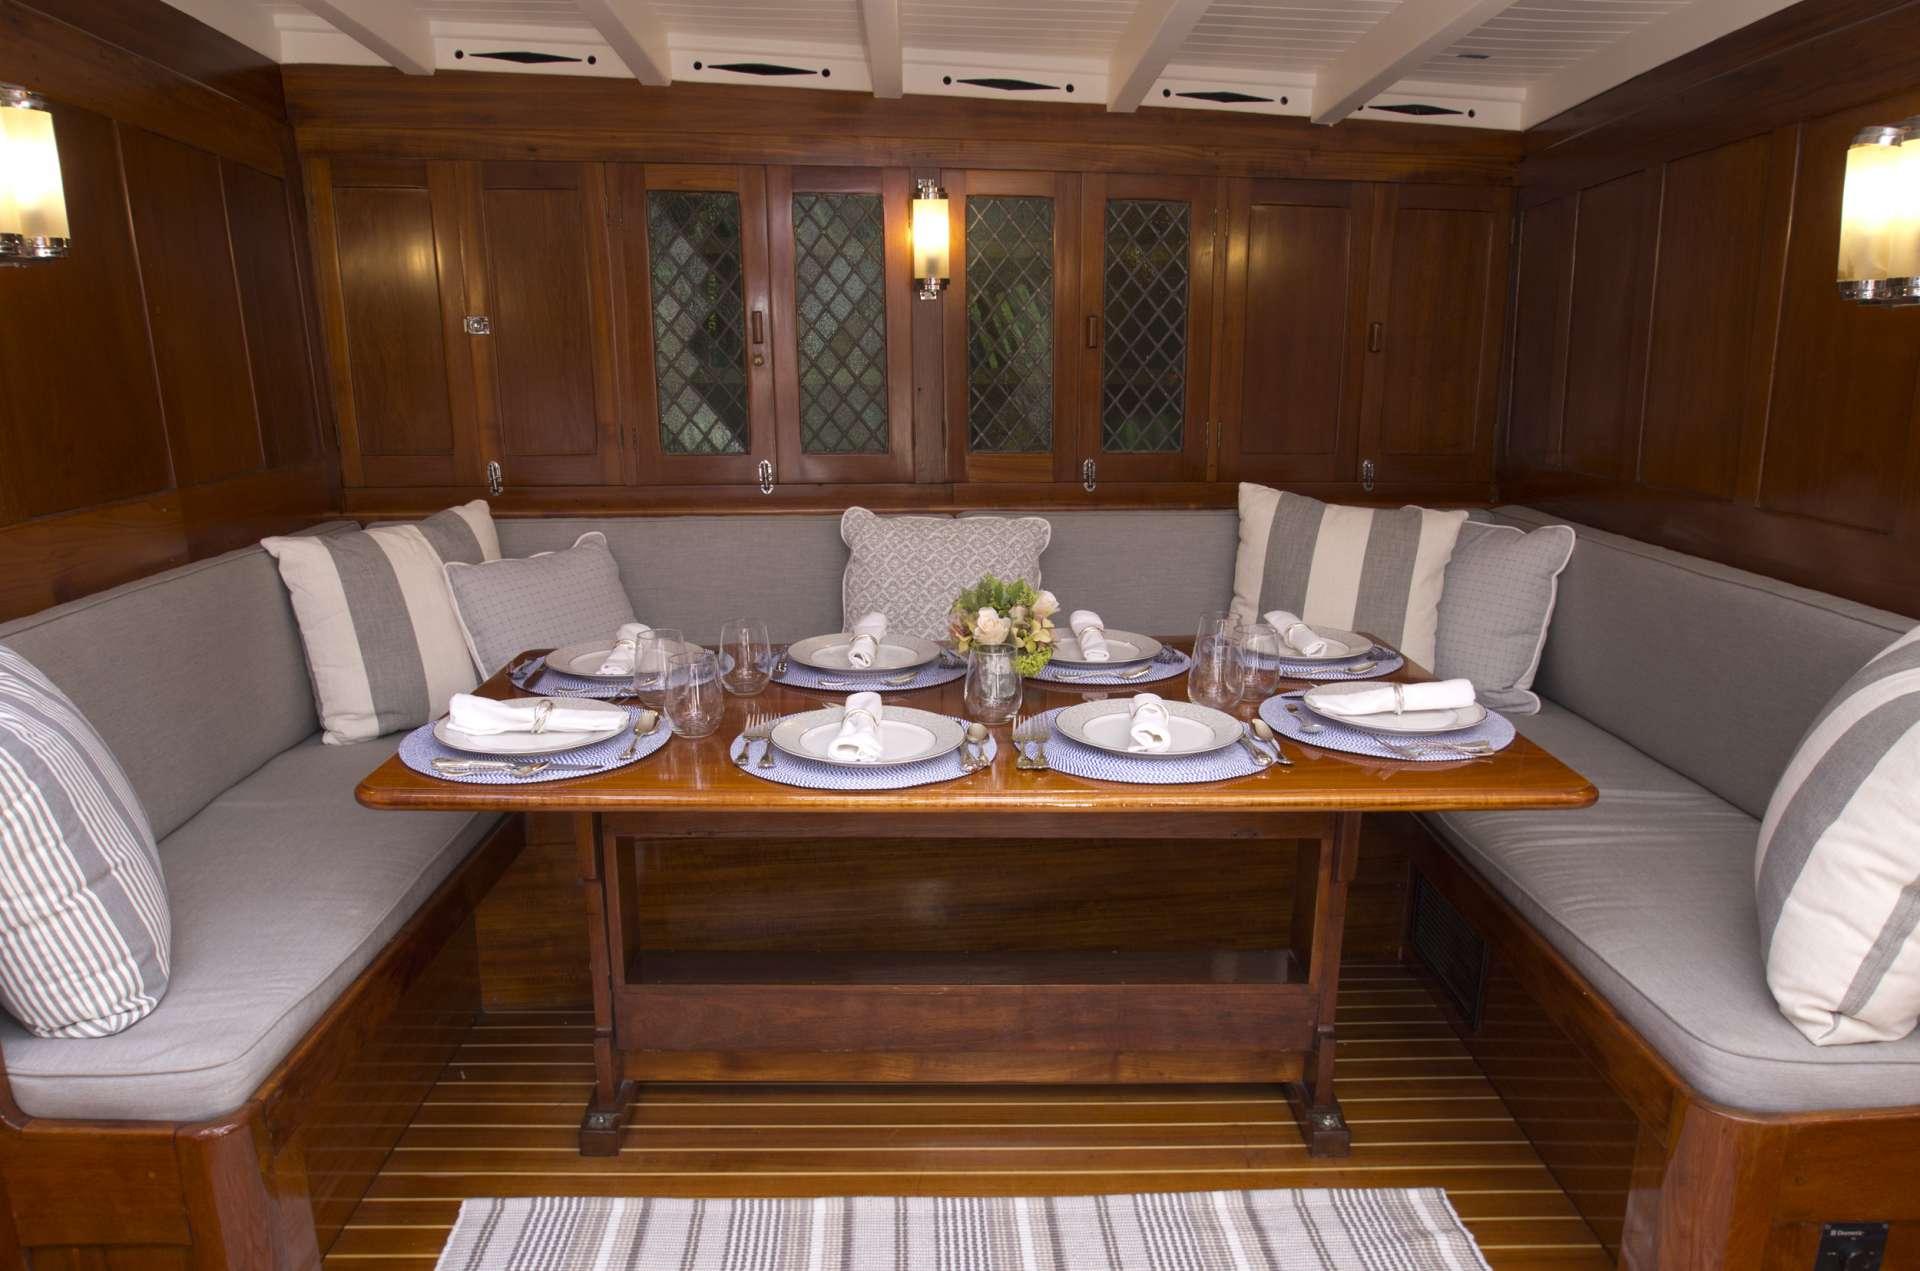 Sail Yacht 'Sail', 10 PAX, 5 Crew, 115.00 Ft, 35.00 Meters, Built 1939, Brooks Motor Craft, Lowestoft, England, Refit Year 2019